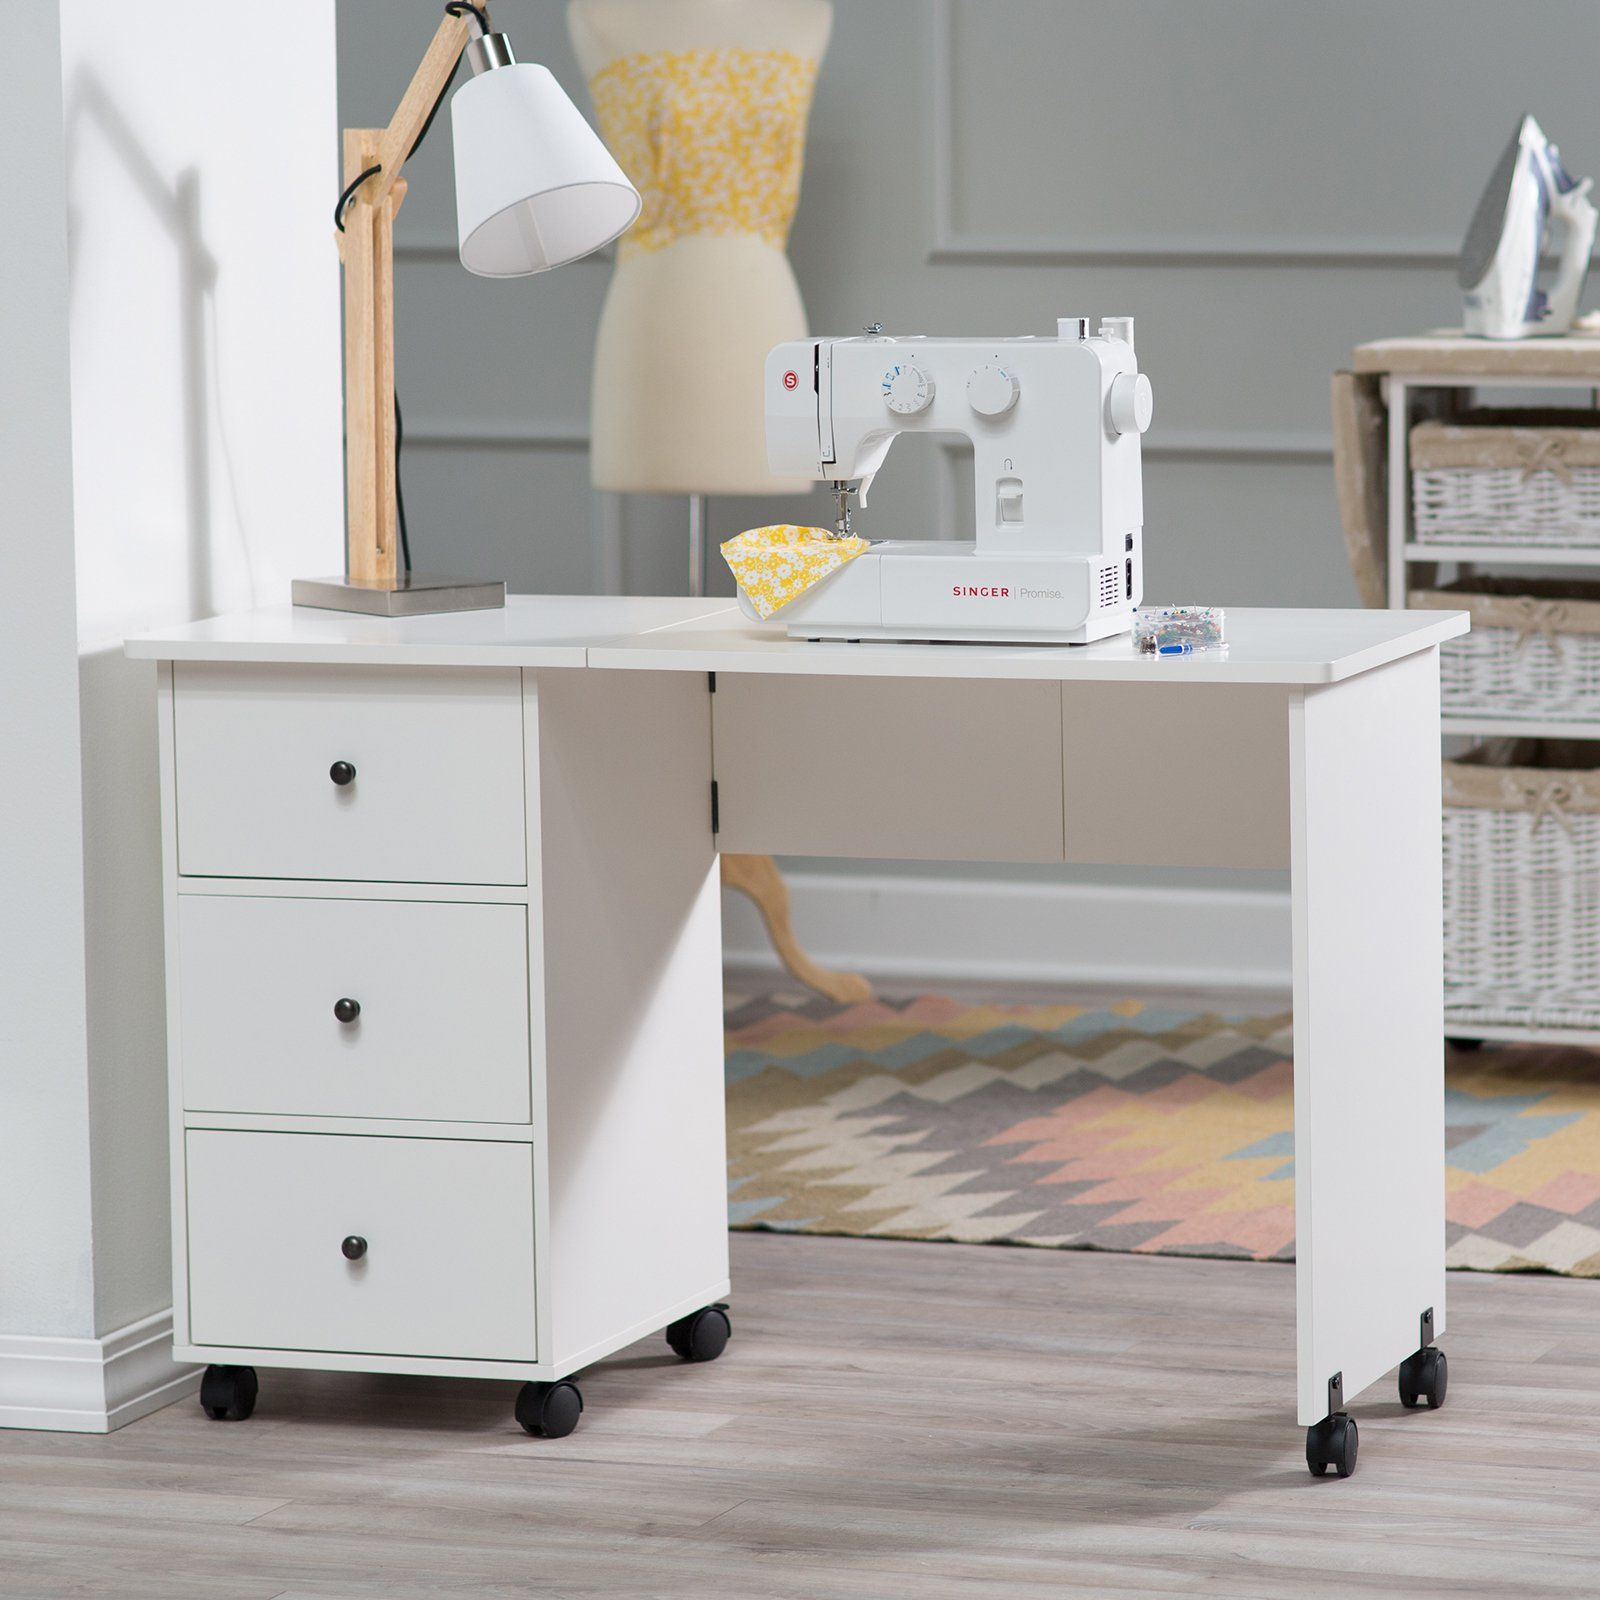 Savannah Folding Mobile Sewing Desk